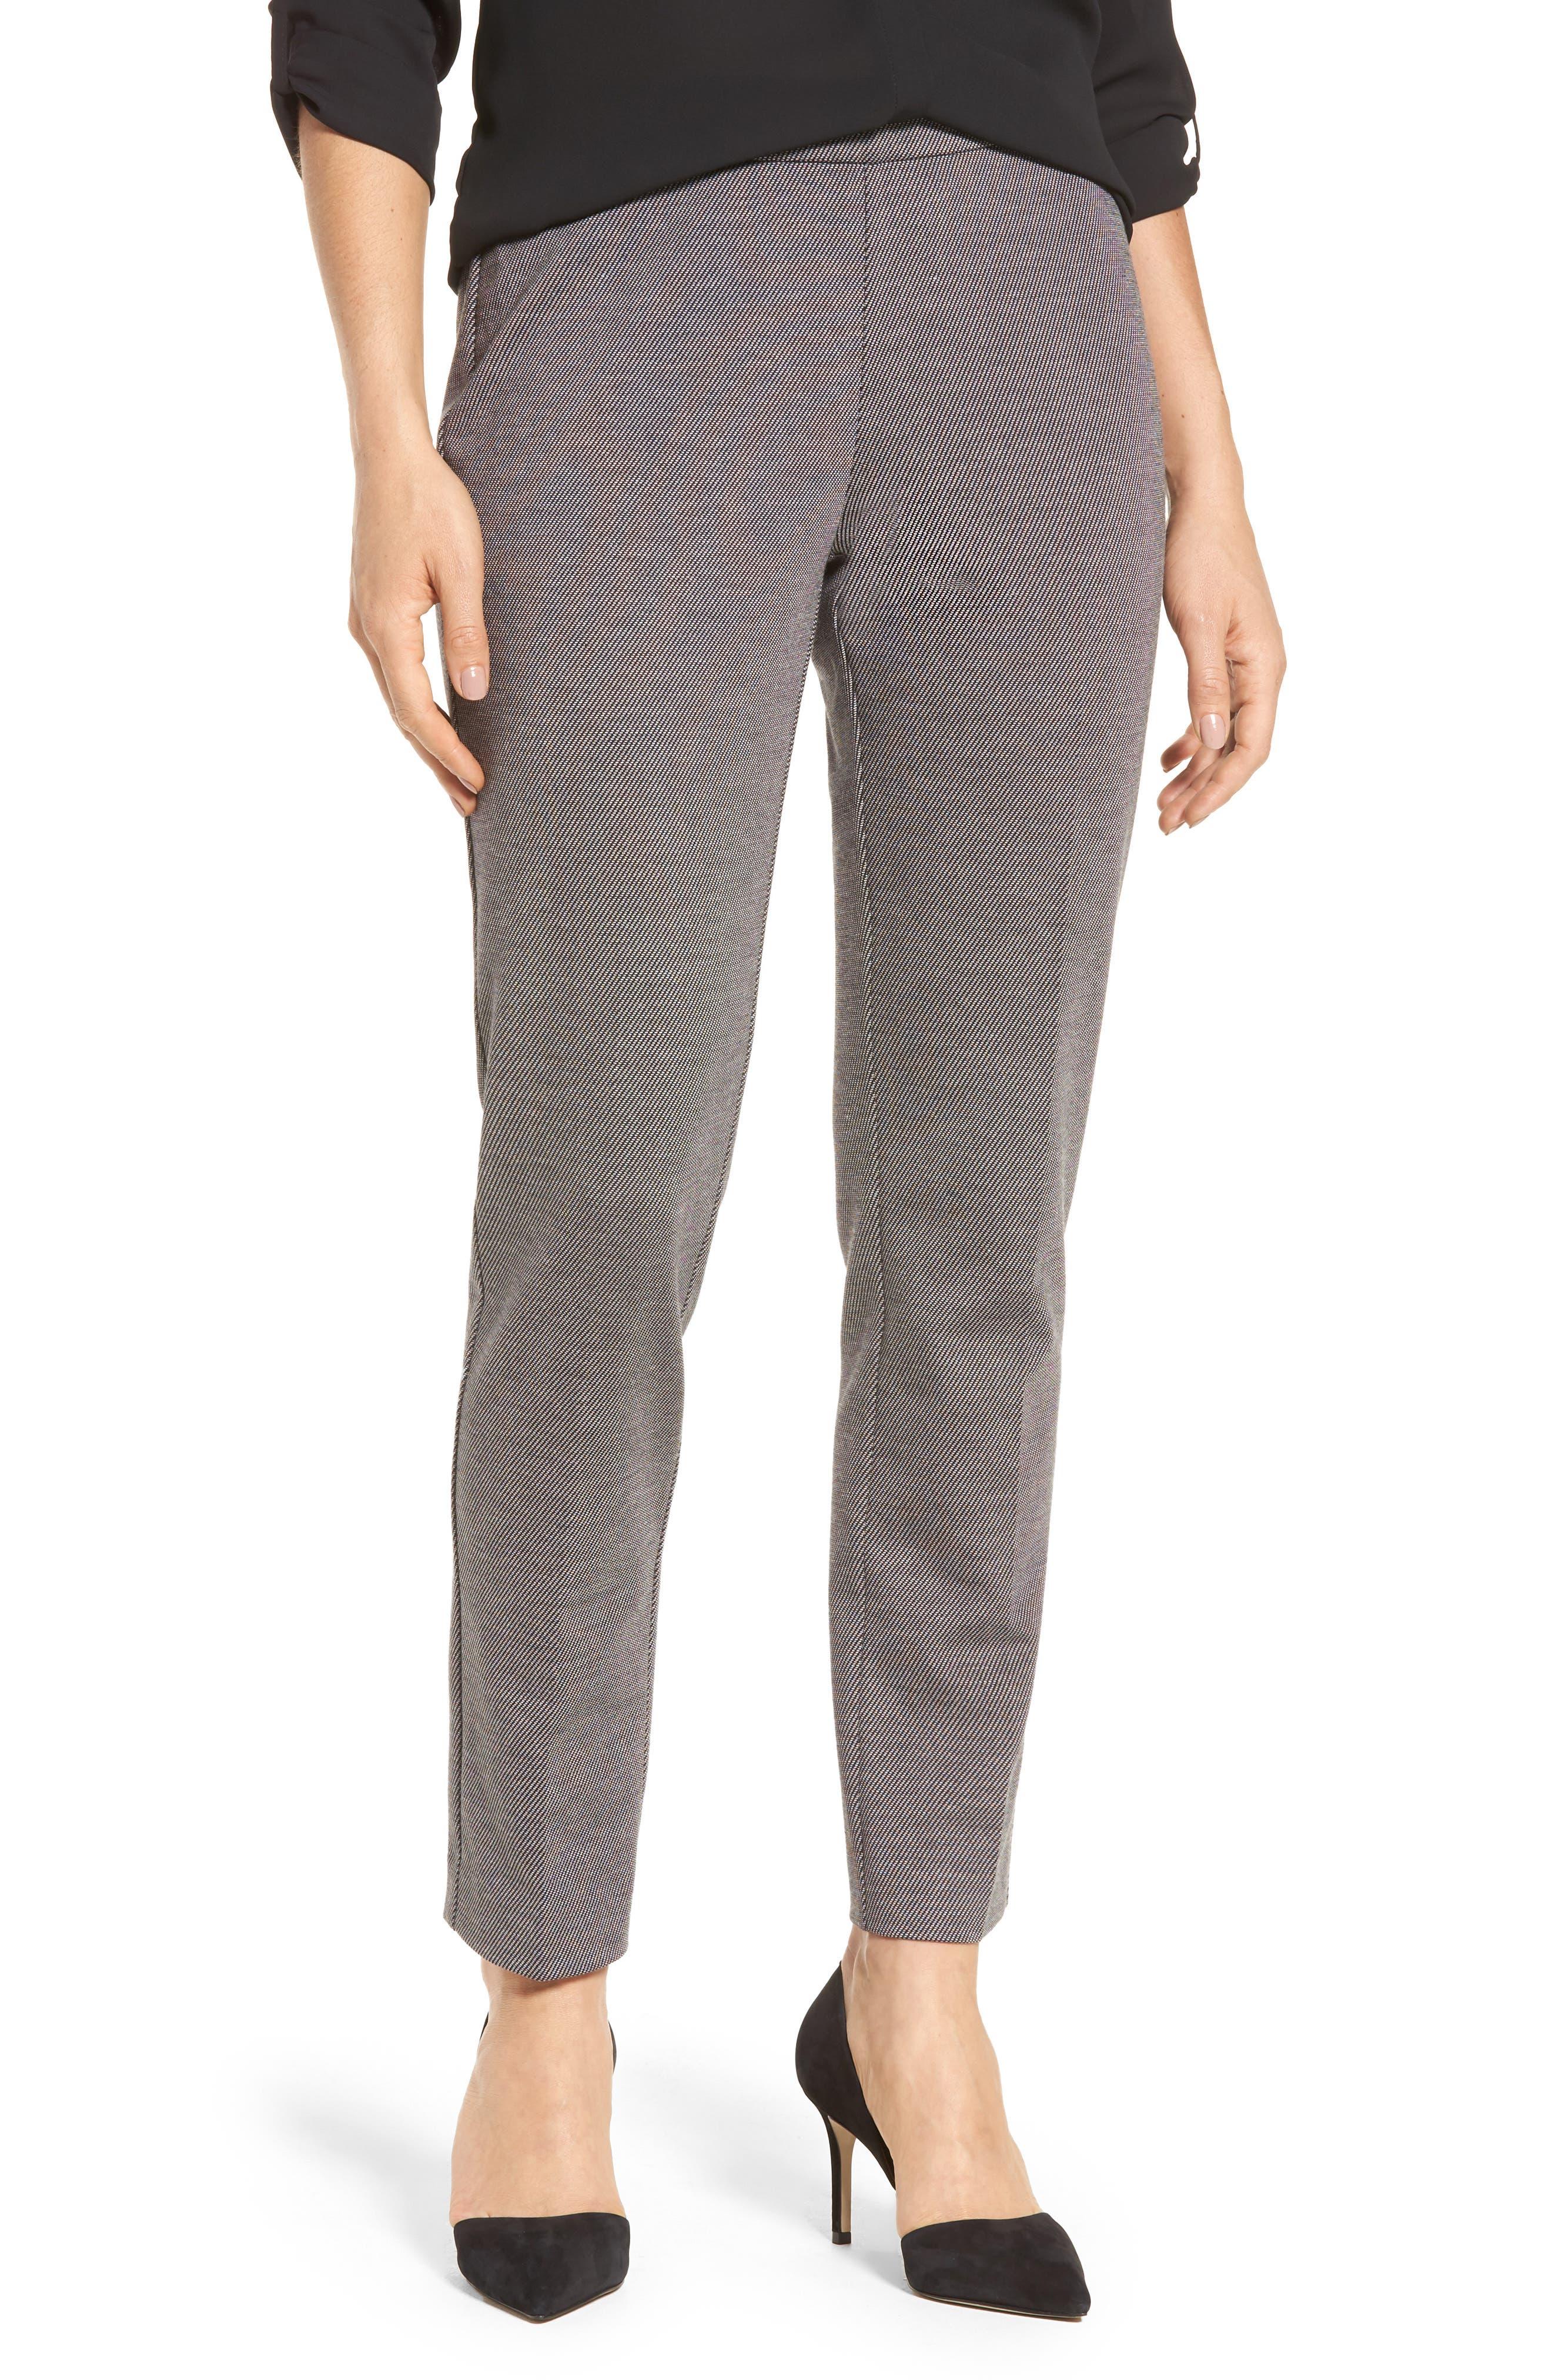 Slim Twill Ponte Knit Pants,                         Main,                         color, 020